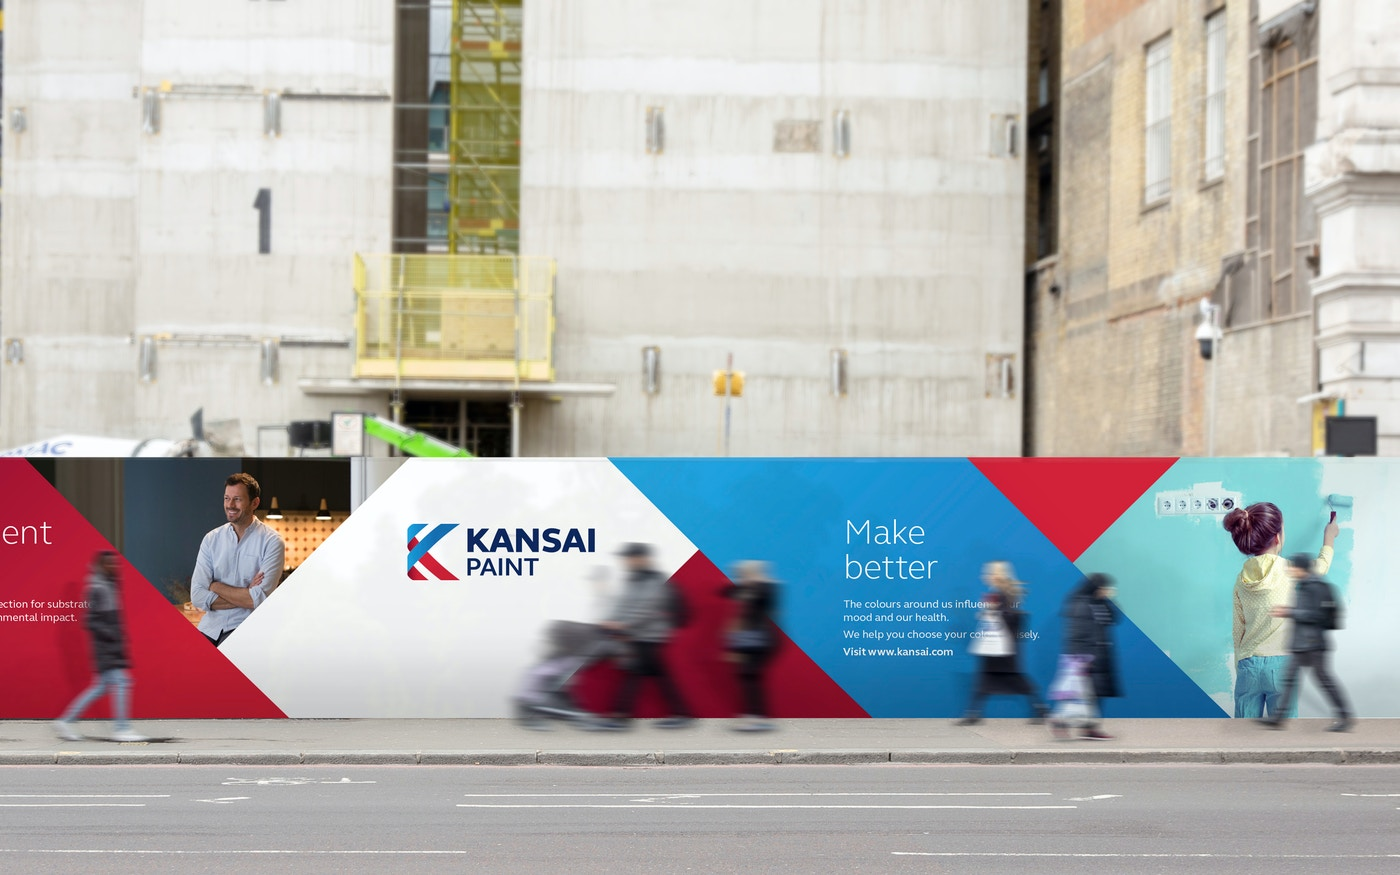 Kansai Paint OOH advertisements